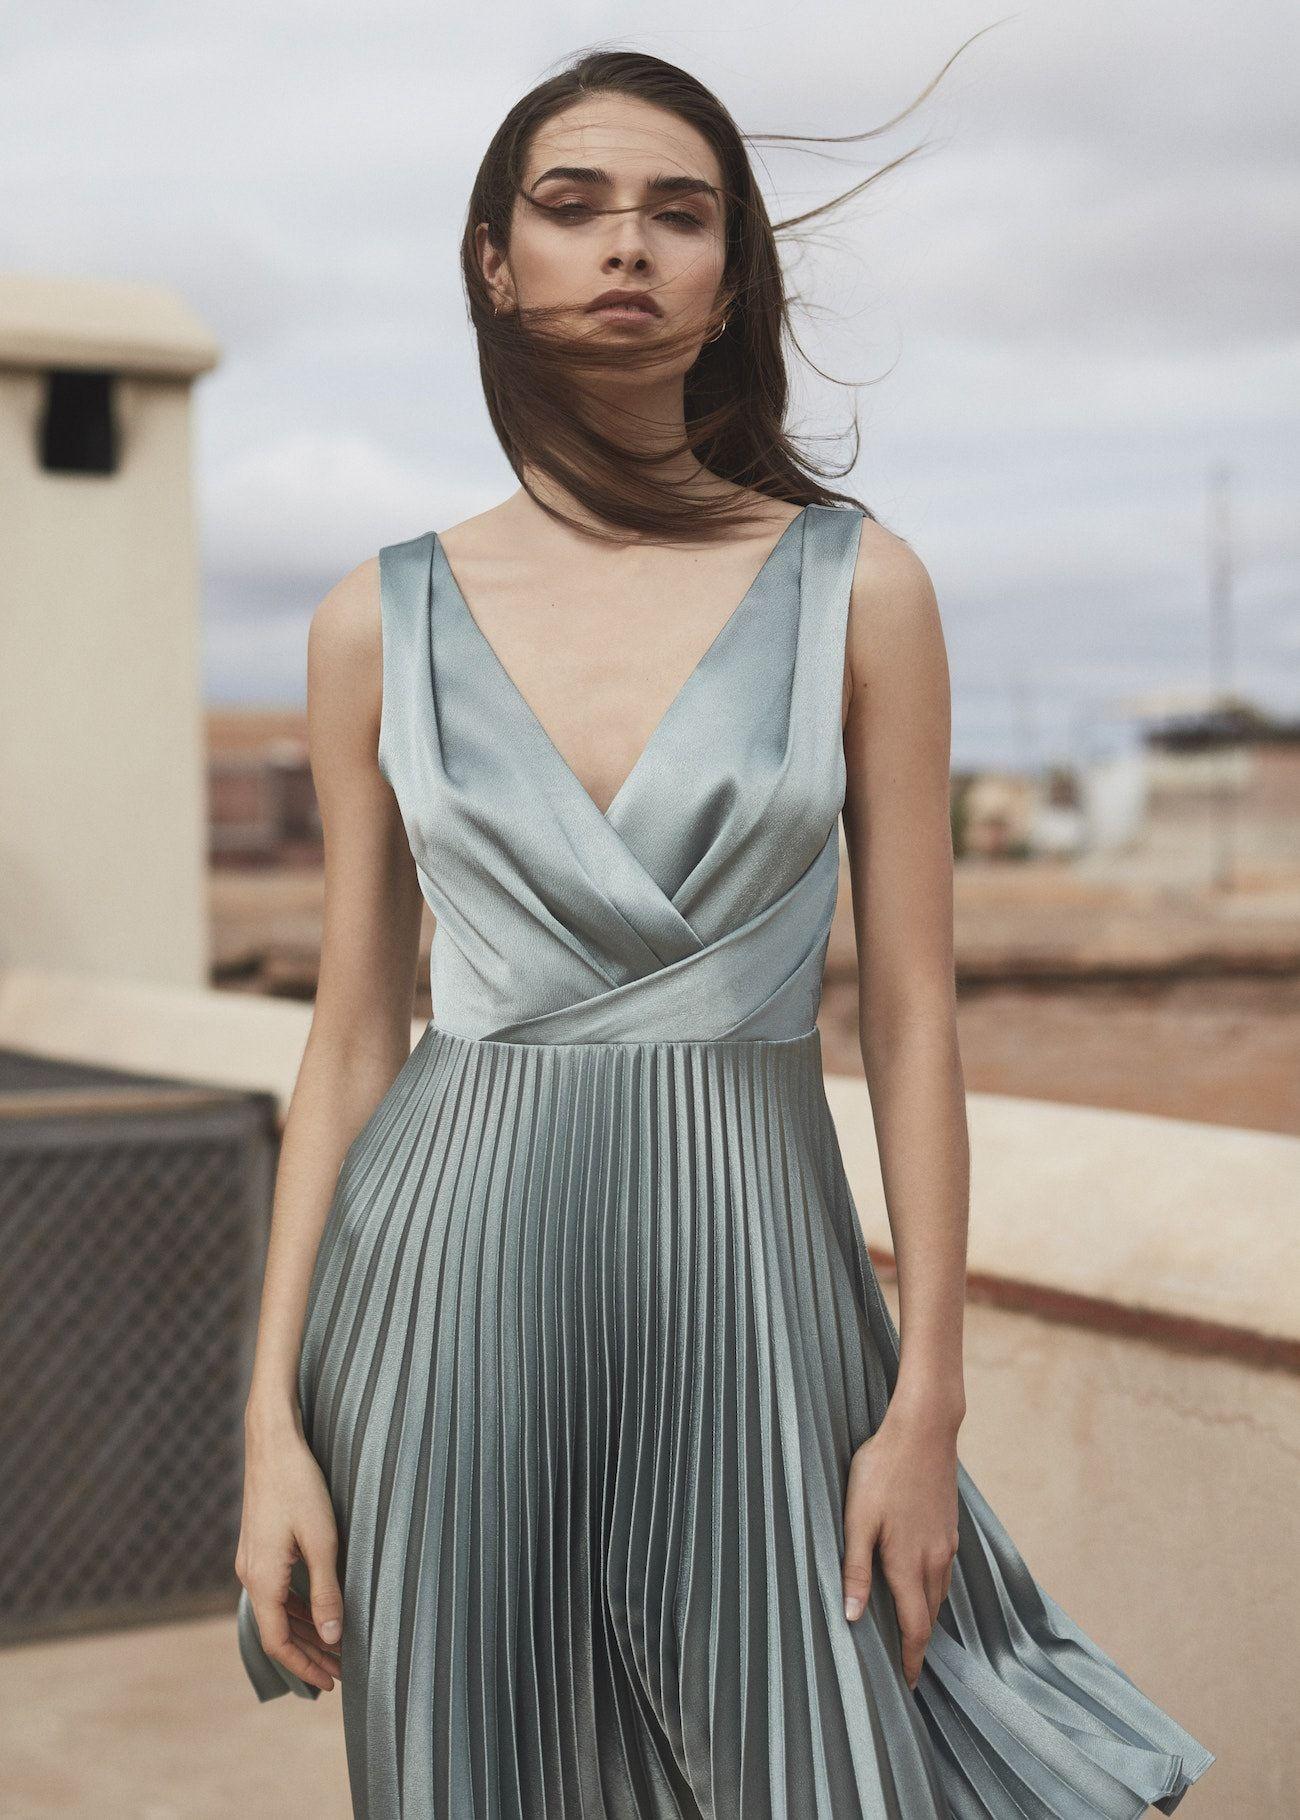 b33e3d735088 Reiss Alicia Knife-pleat Midi Dress for Bridesmaid Dress ...